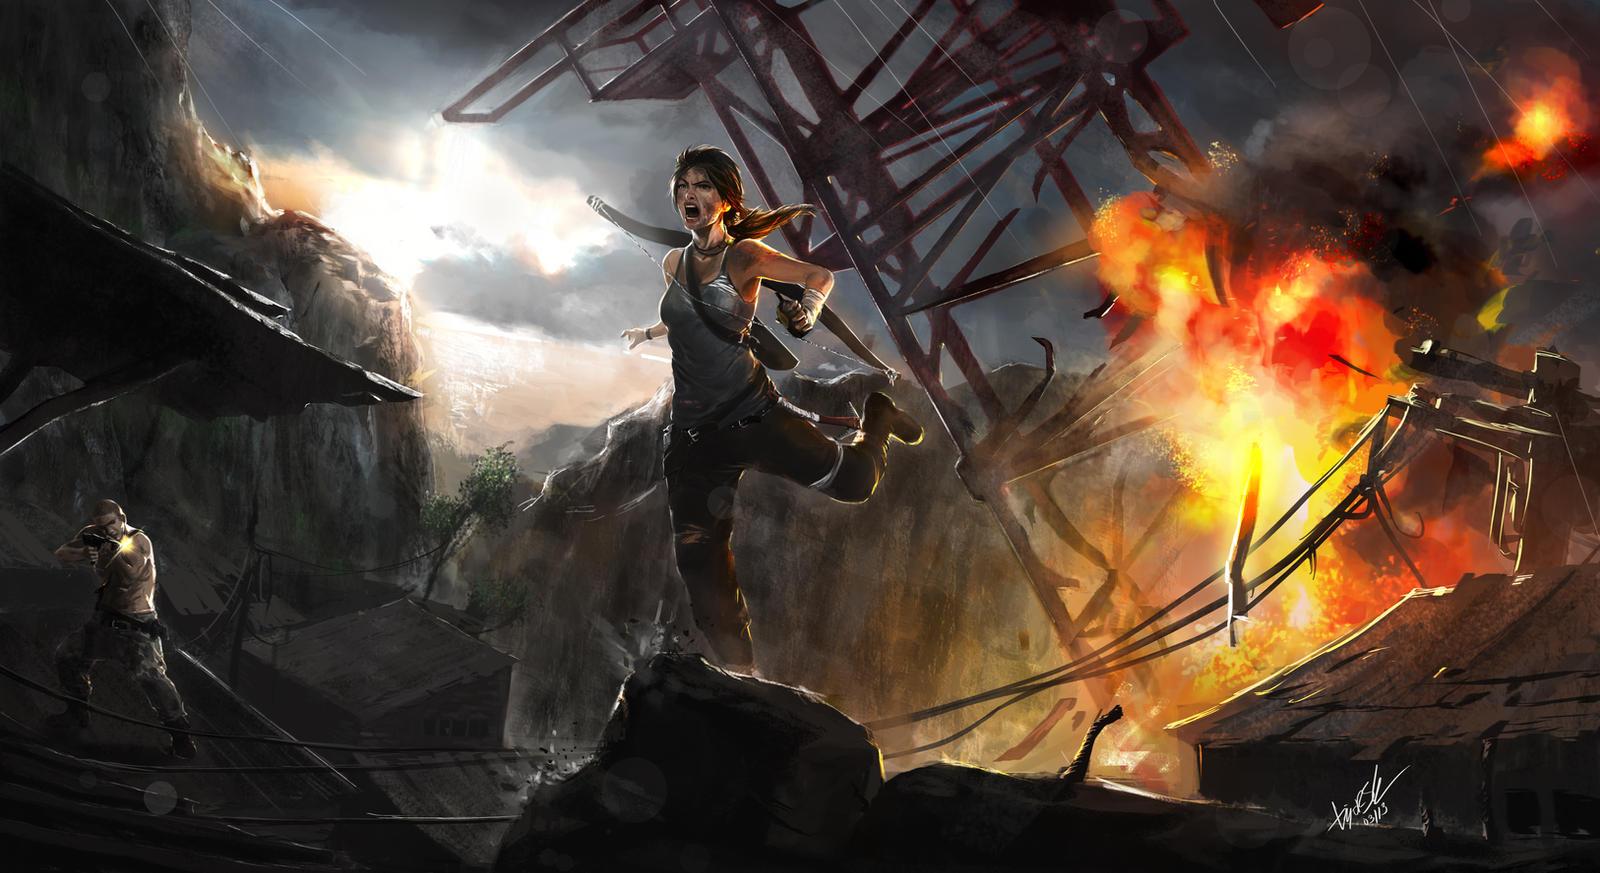 Tomb Raider Reborn - Explosive!! by DiegooCunha